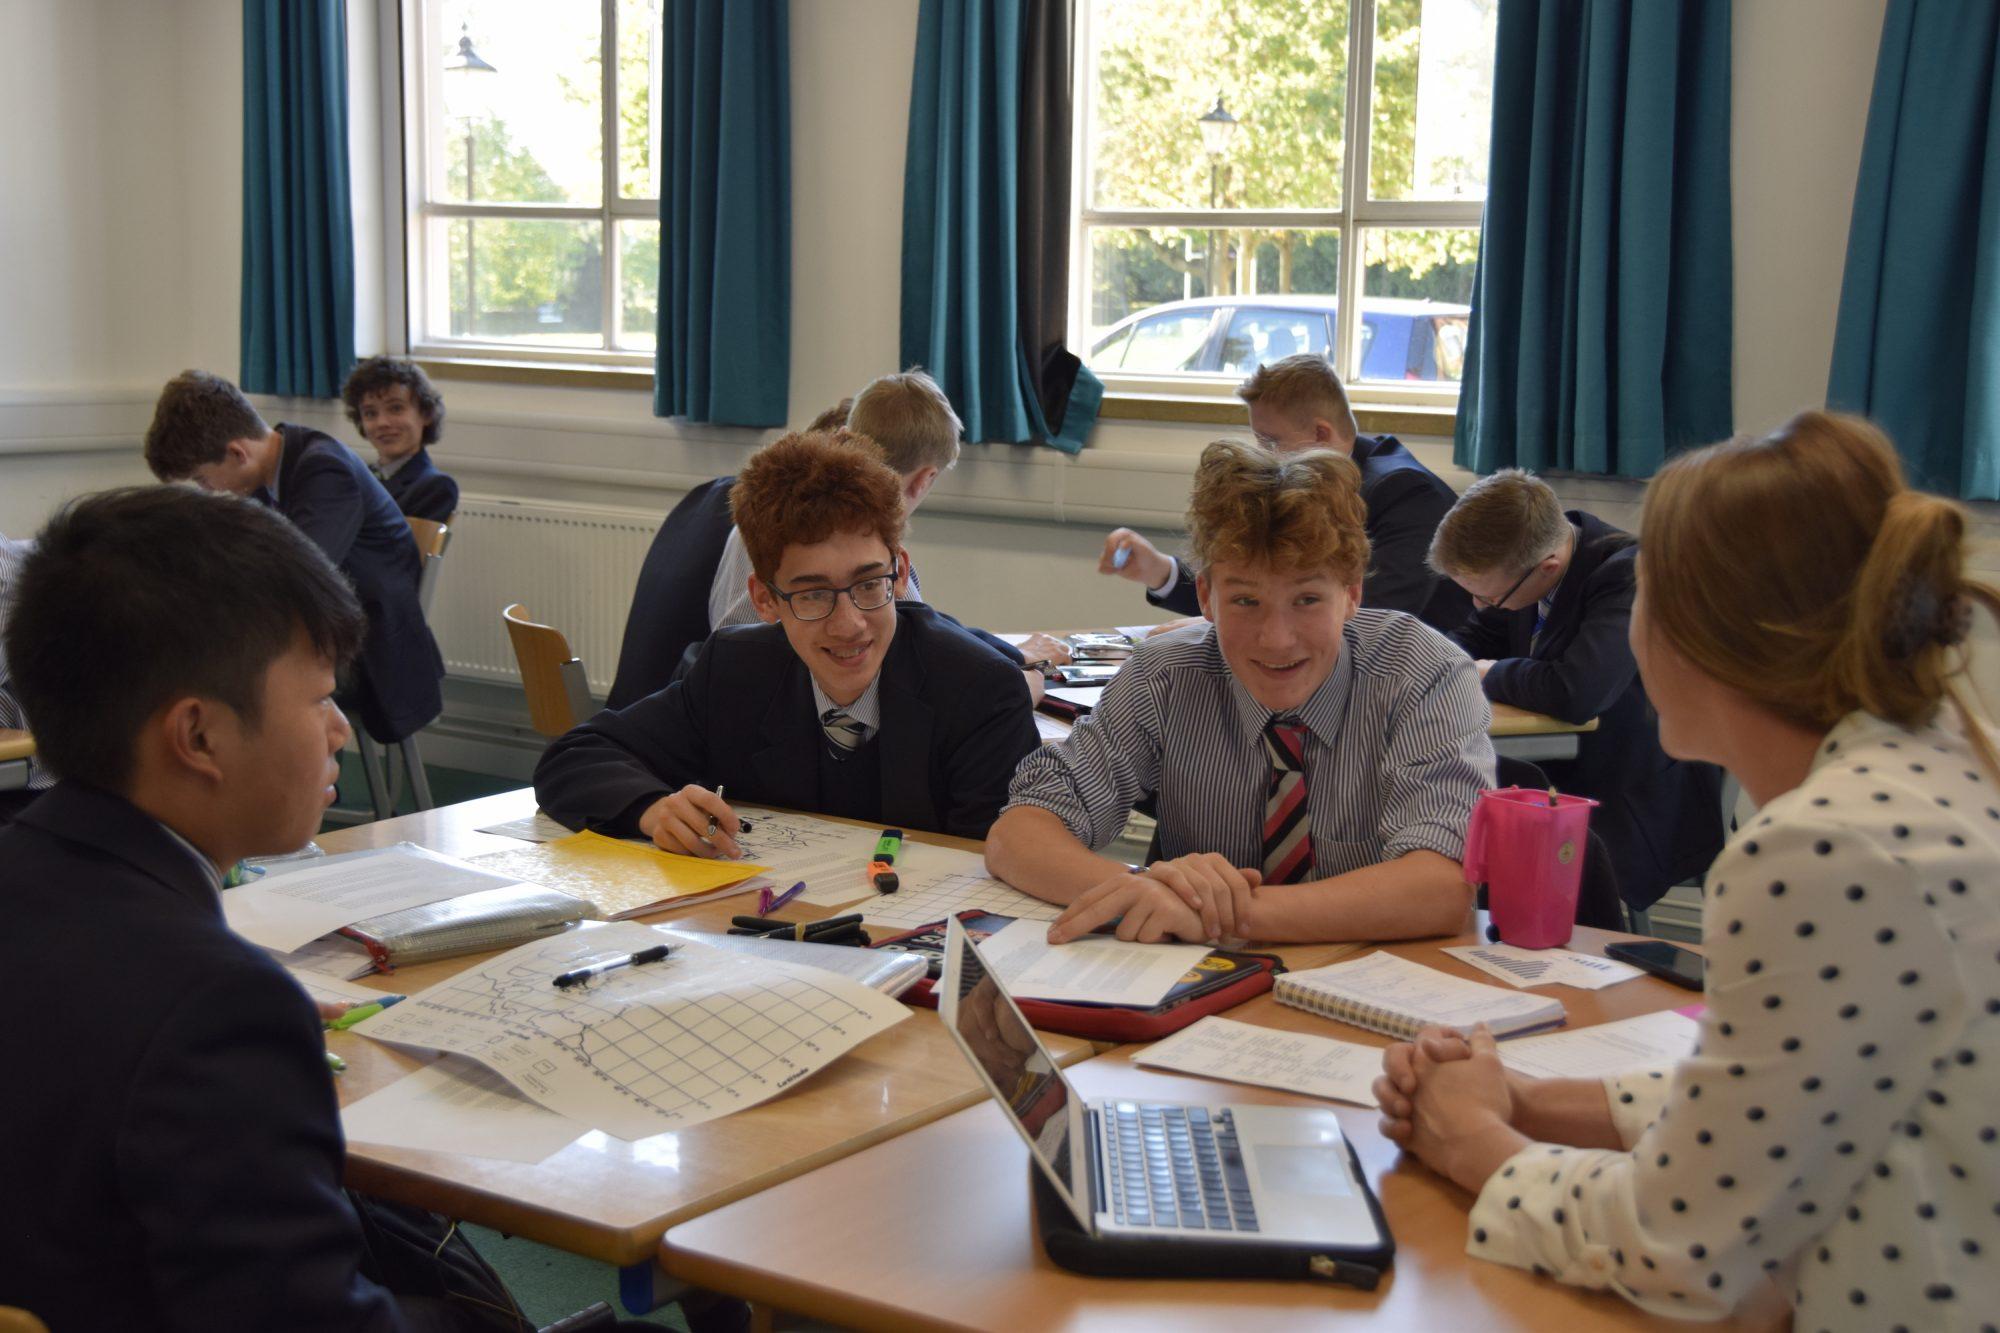 Abingdon School geography lesson